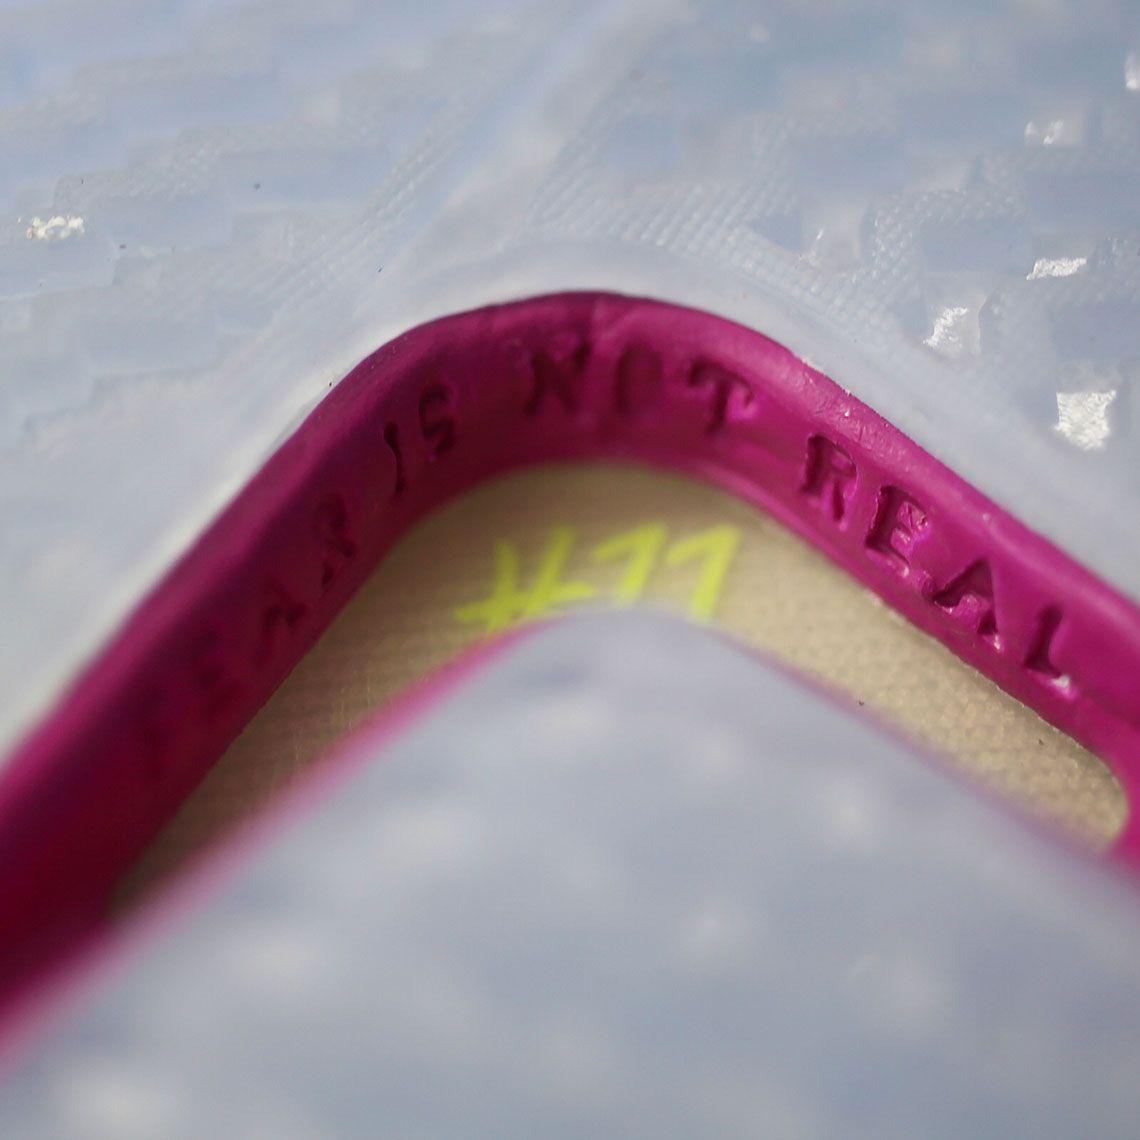 ff893956faee Nike Kyrie 4 Confetti - Release Date + Photos